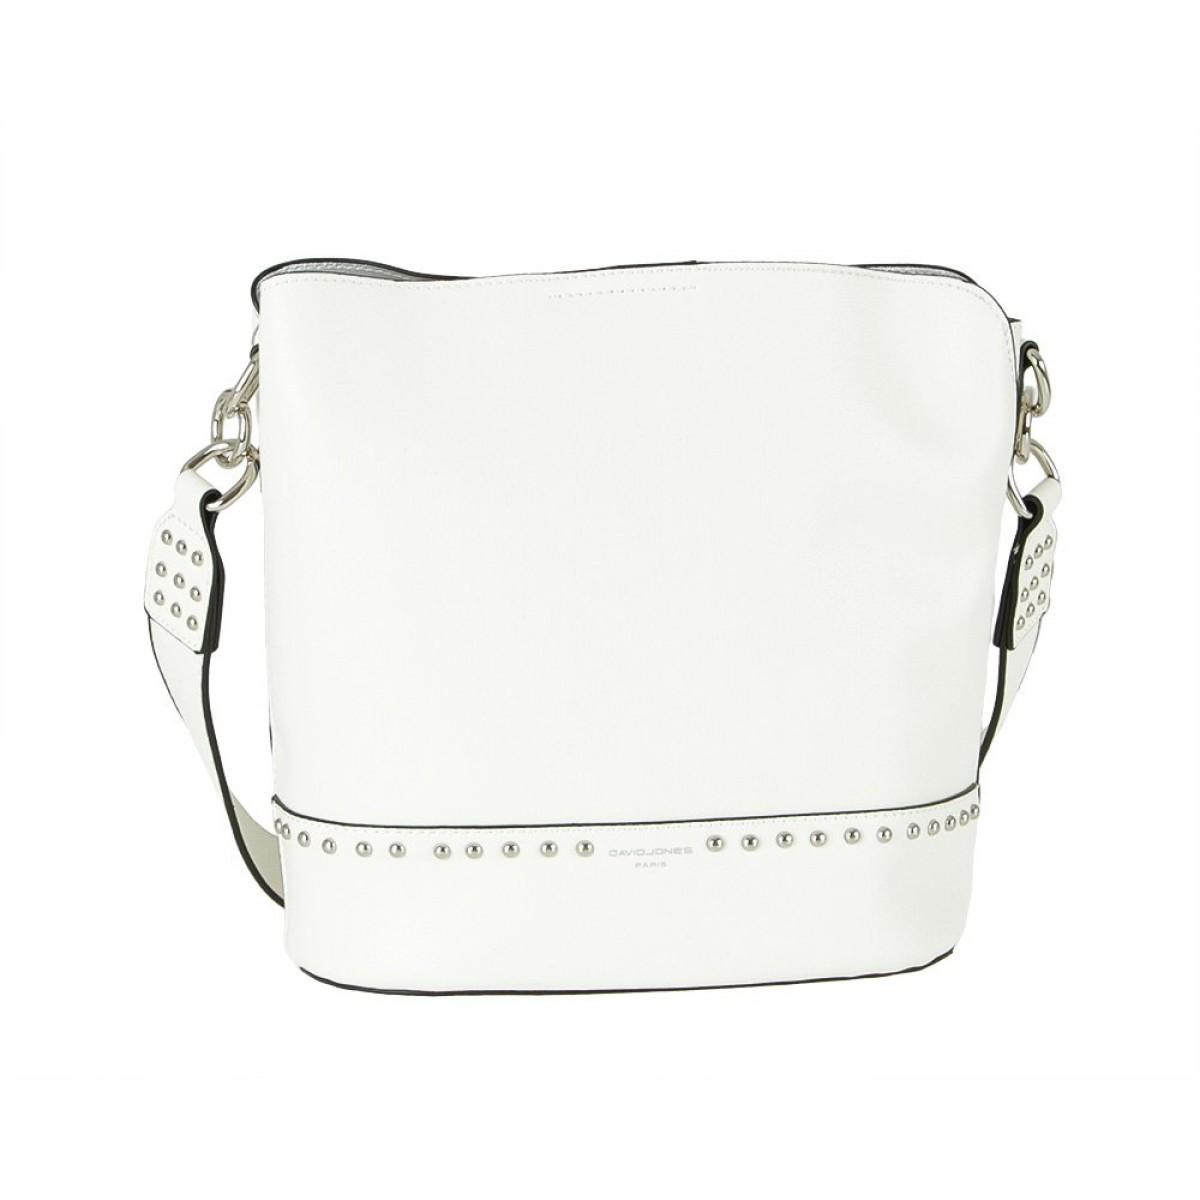 Жіноча сумка David Jones CM5774 WHITE